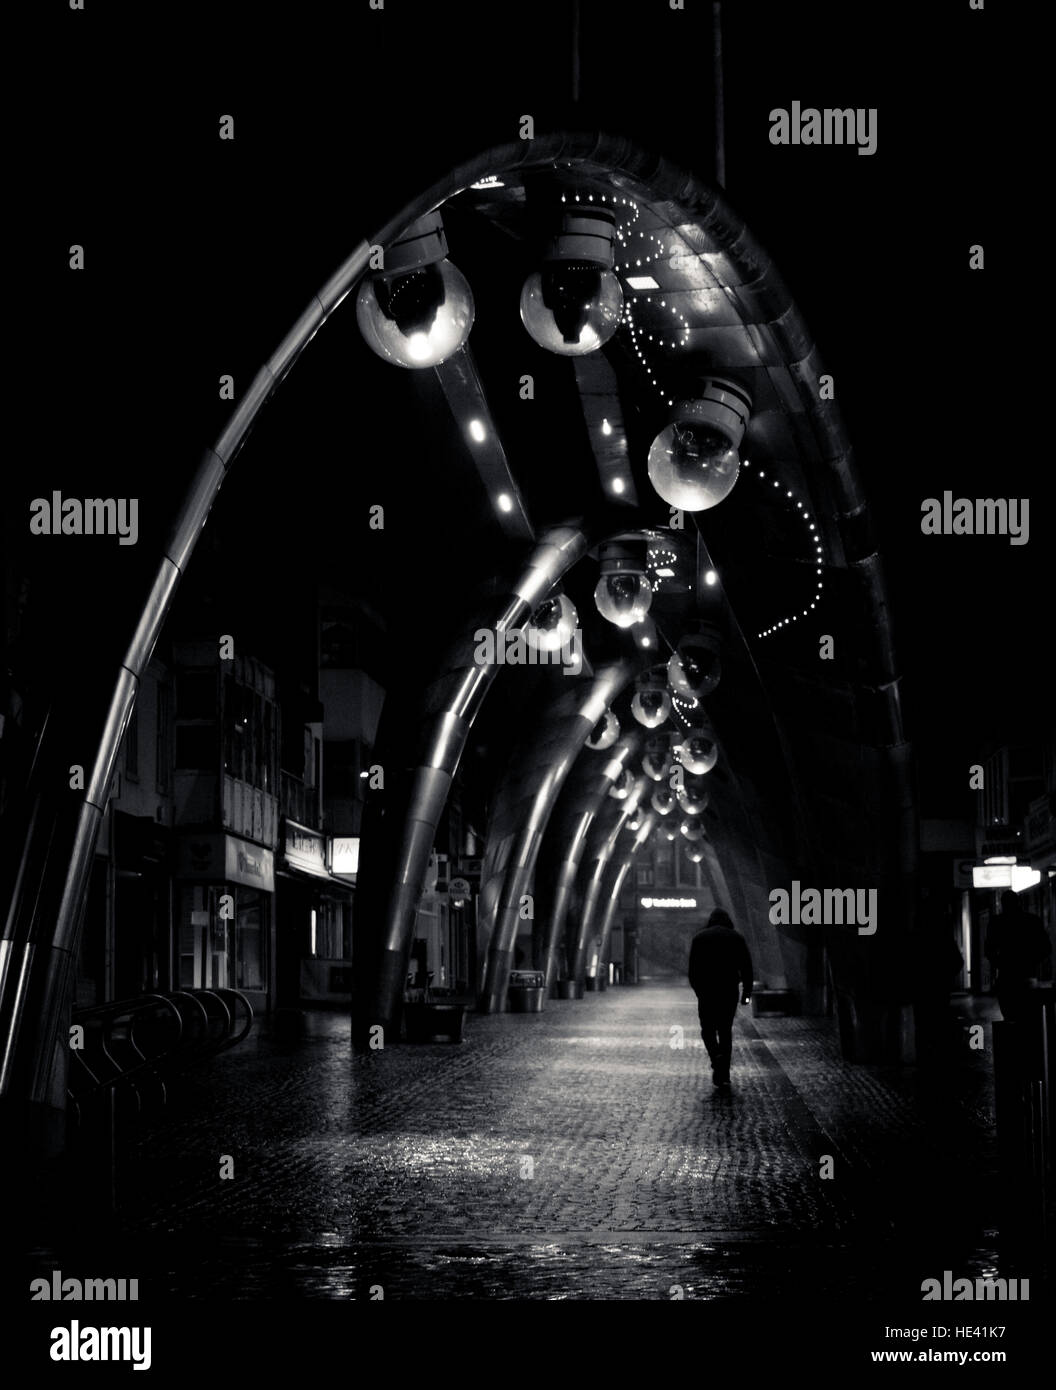 night, street, lights, person, single, solo, shadows, installation, fancy, path, figure, artsy, artistic, b&w, mono, Stock Photo